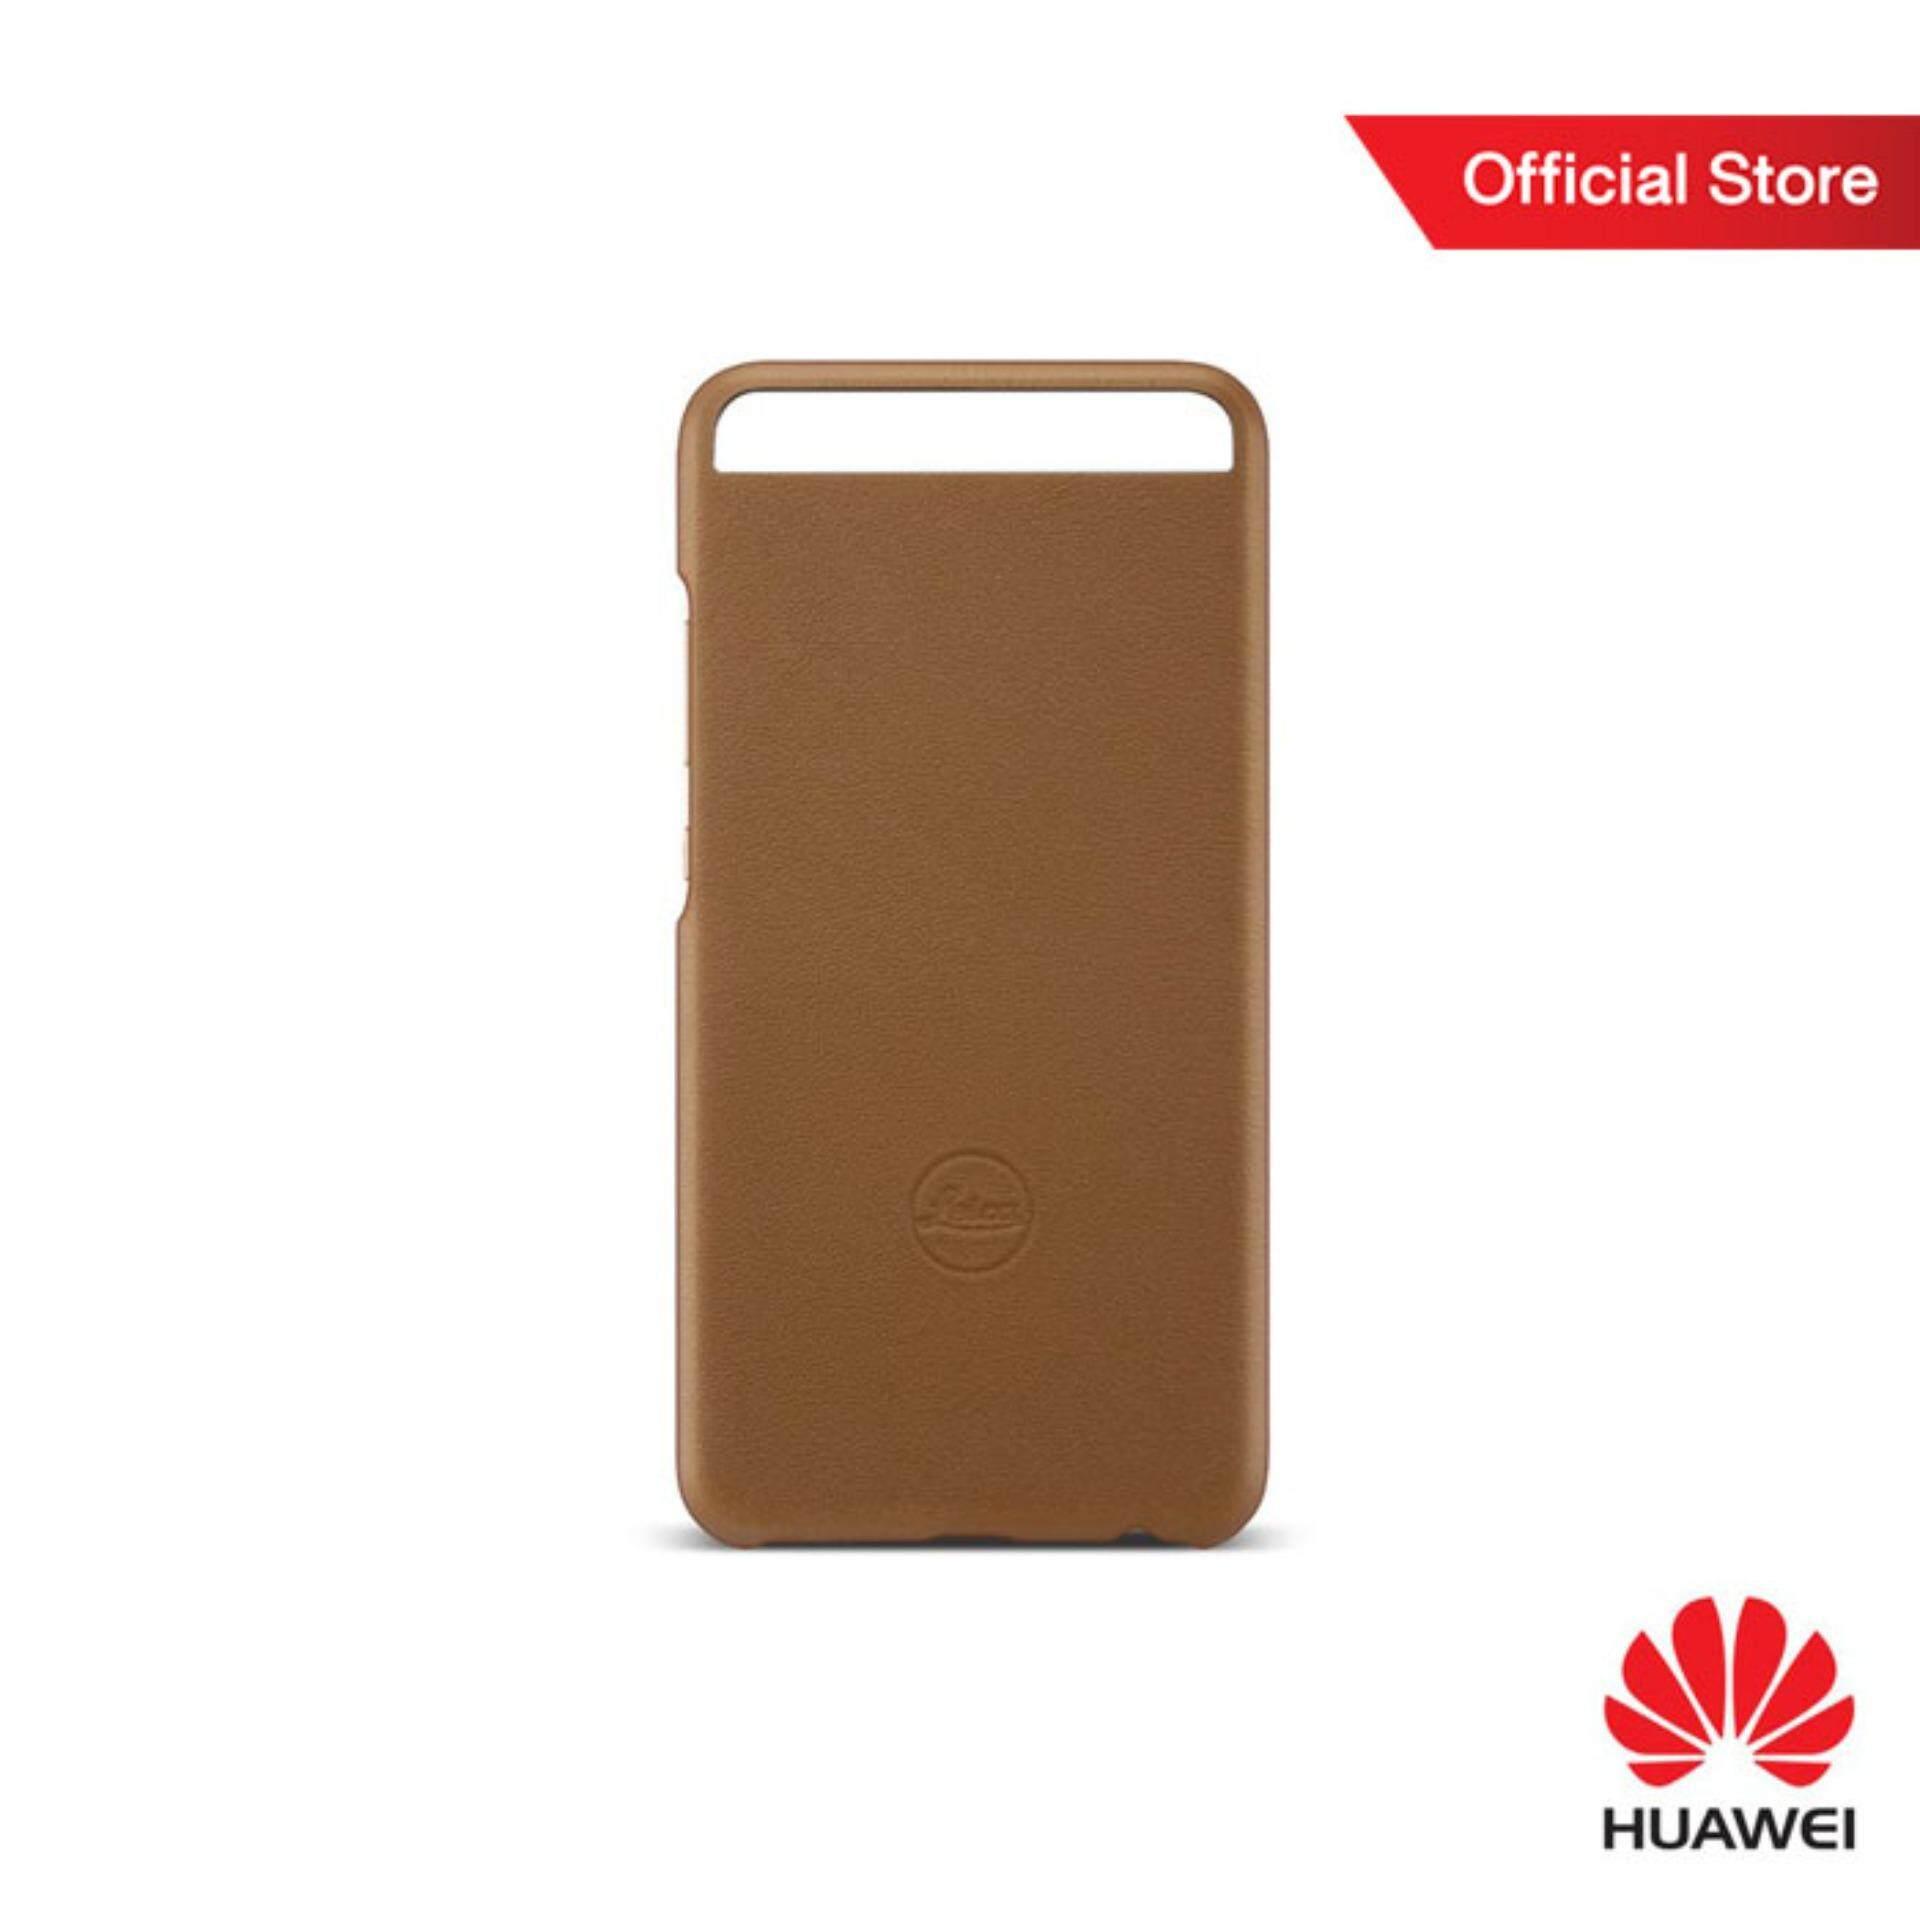 Huawei P10 PLUS Leica Case Brown